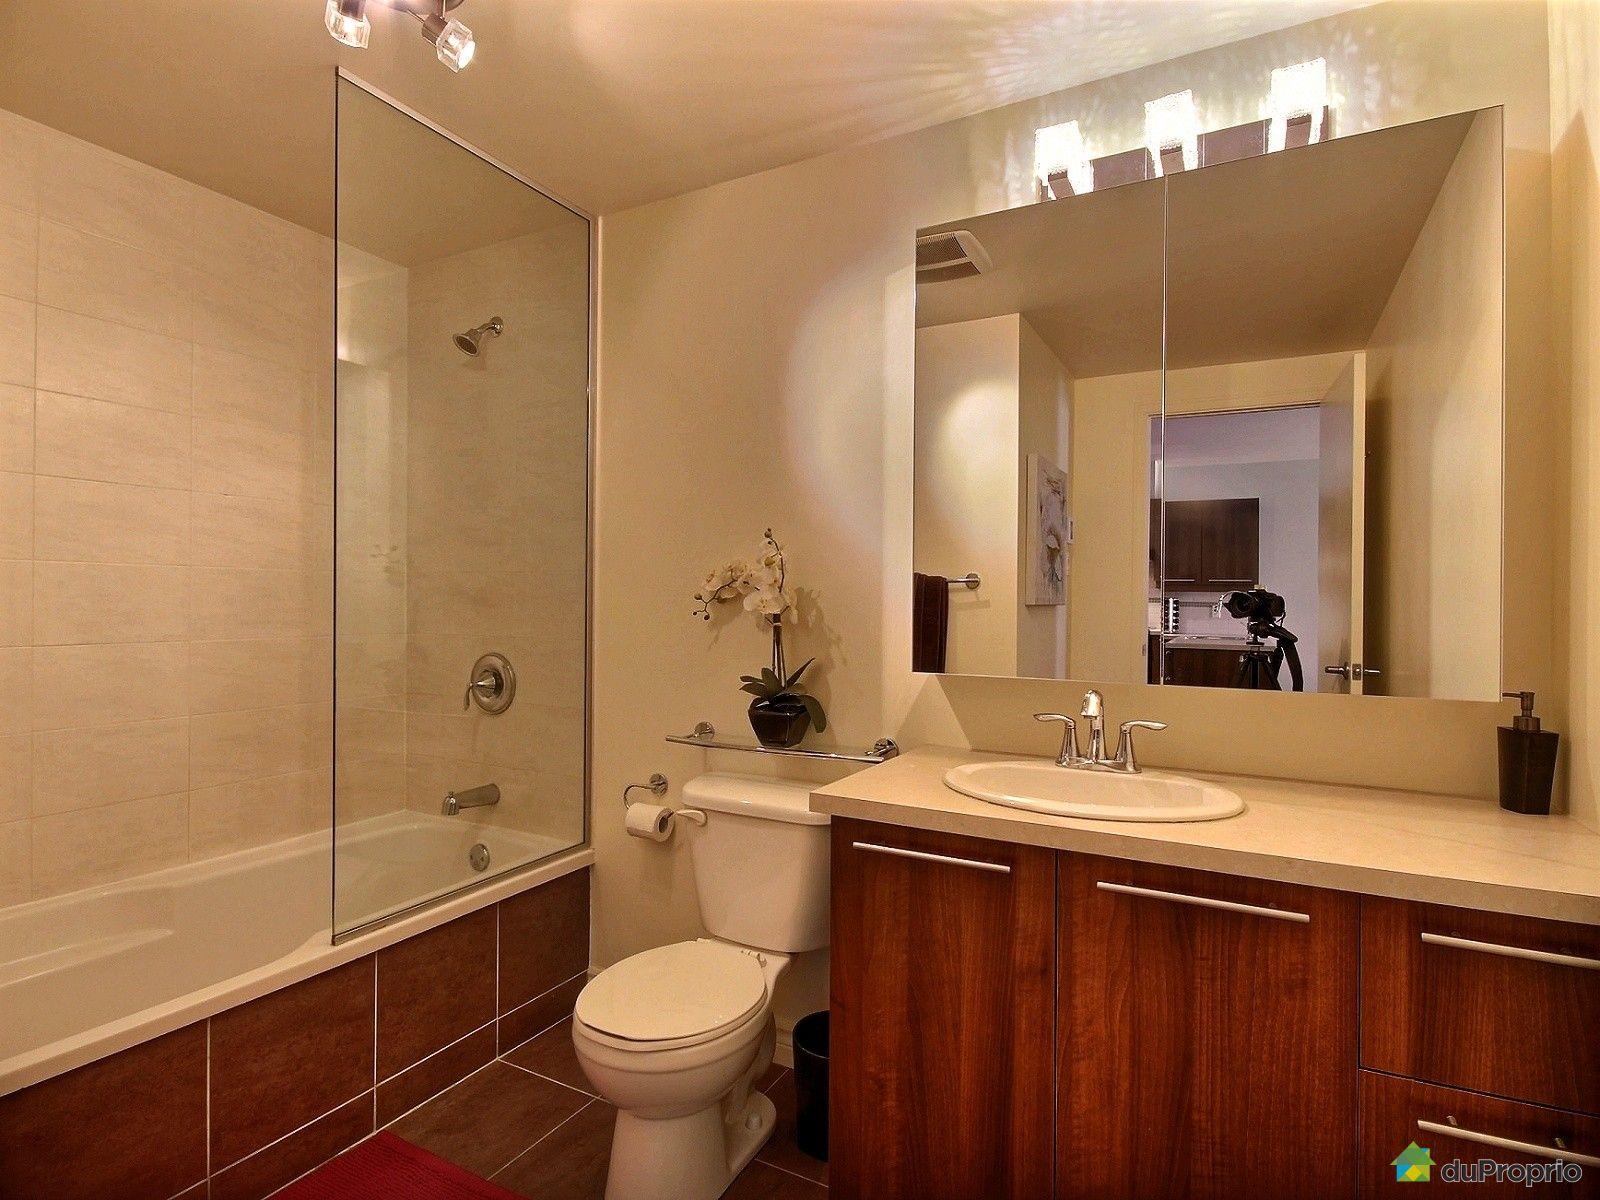 Condo vendre laval des rapides 607 1925 rue mile for Salle de bain laval